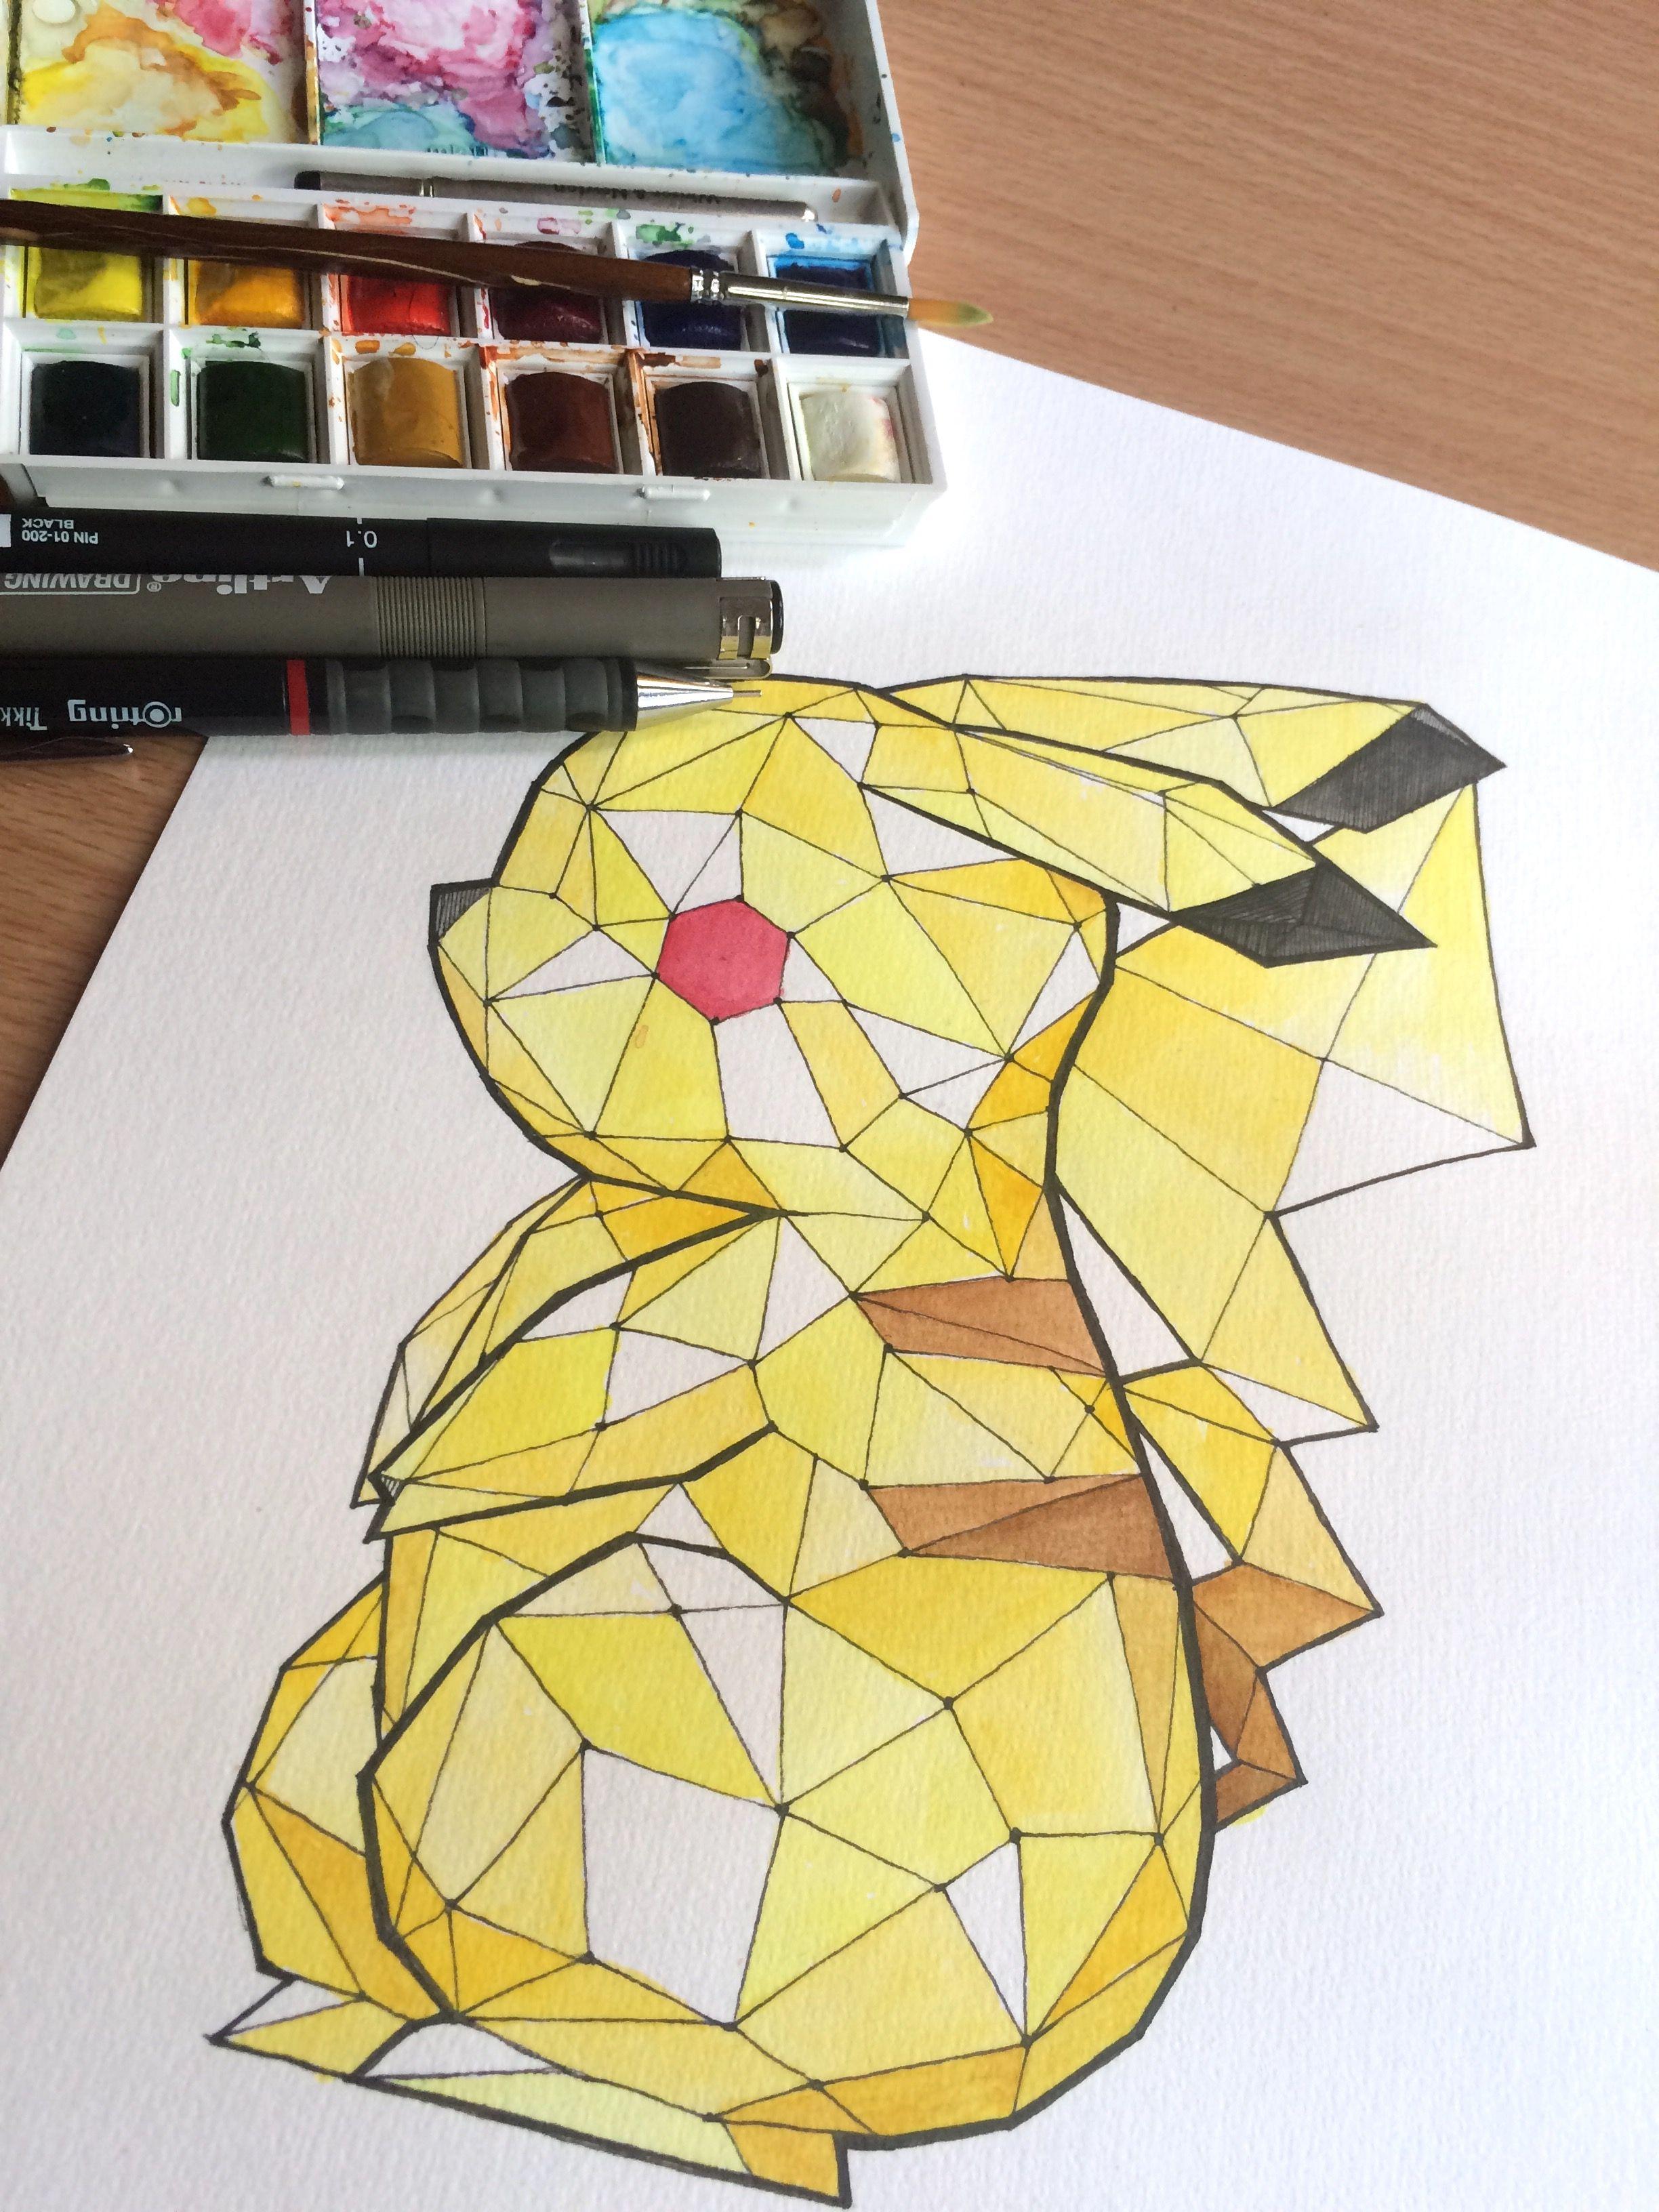 Water color, LowPoly Pikachu Pikachu drawing, Geometric